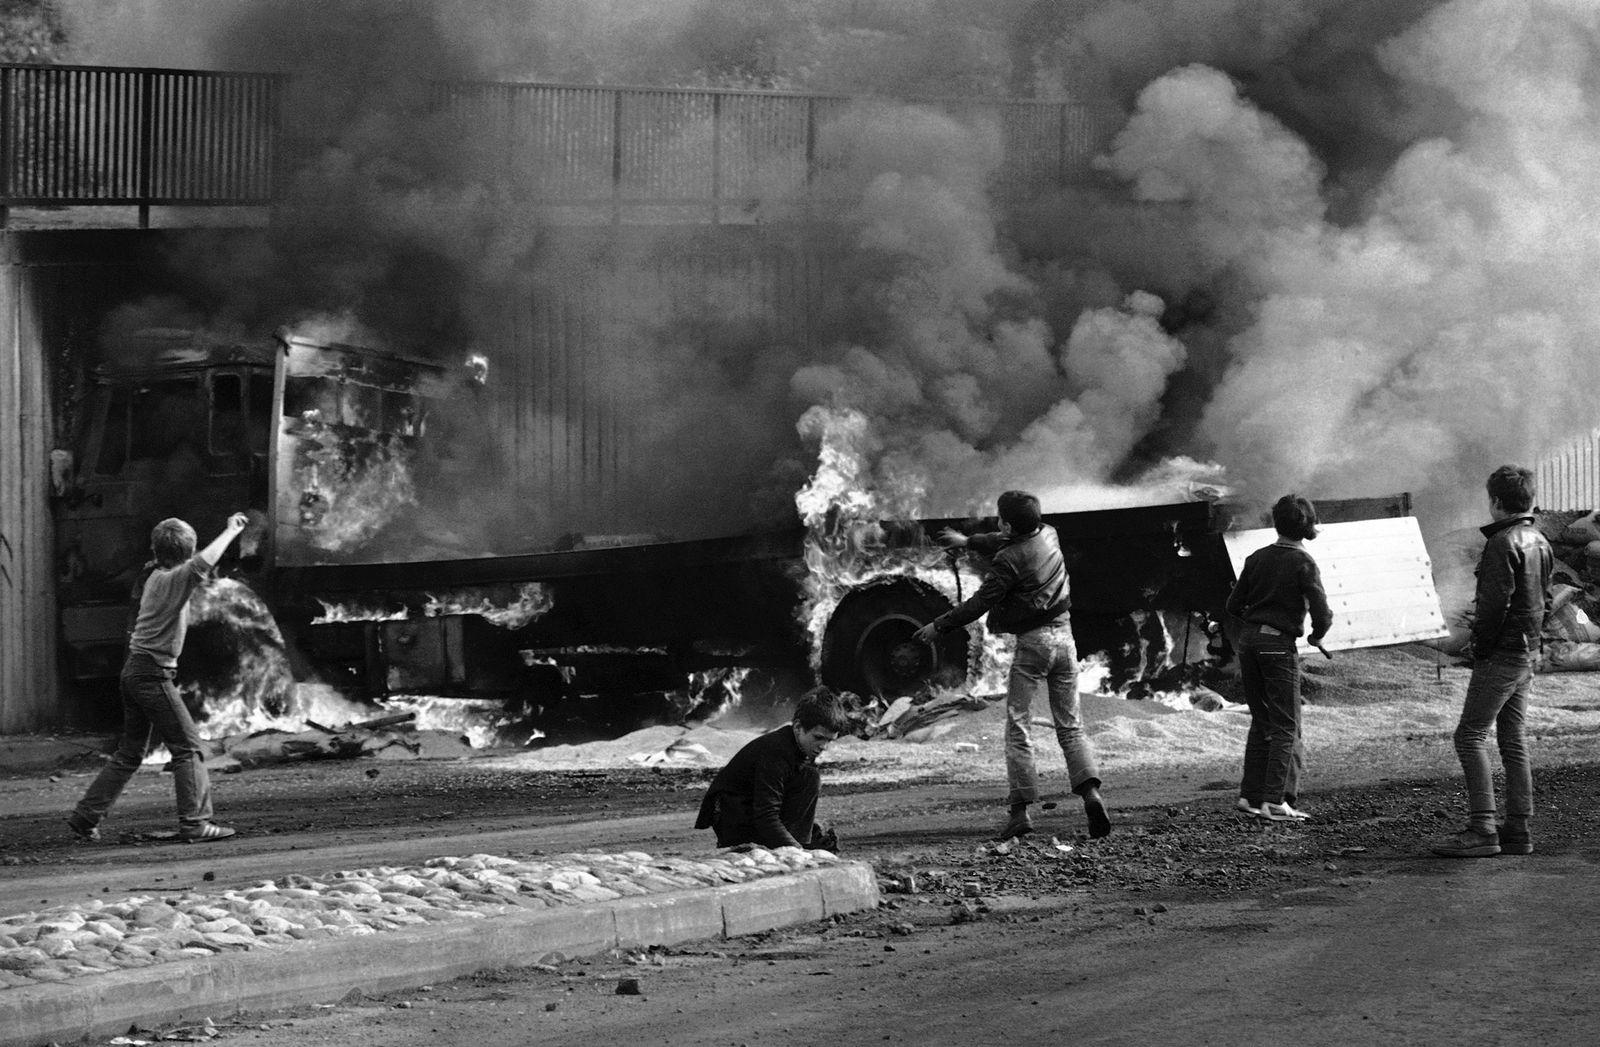 IRA Hunger Strike 1981: Protest